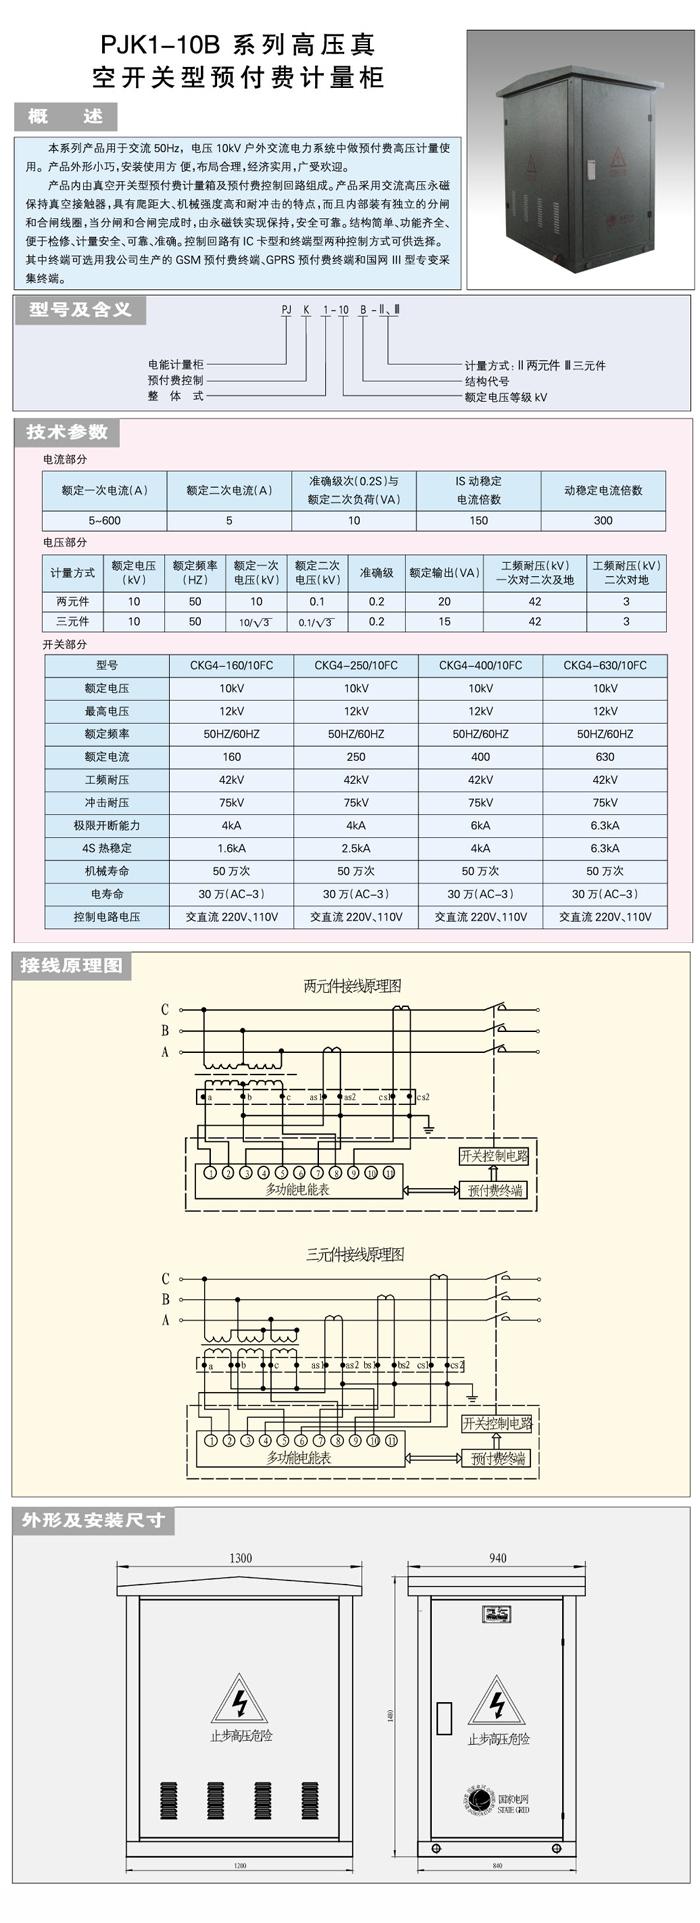 PJK1-10B系列高压真空开关型预付费计量柜-.jpg